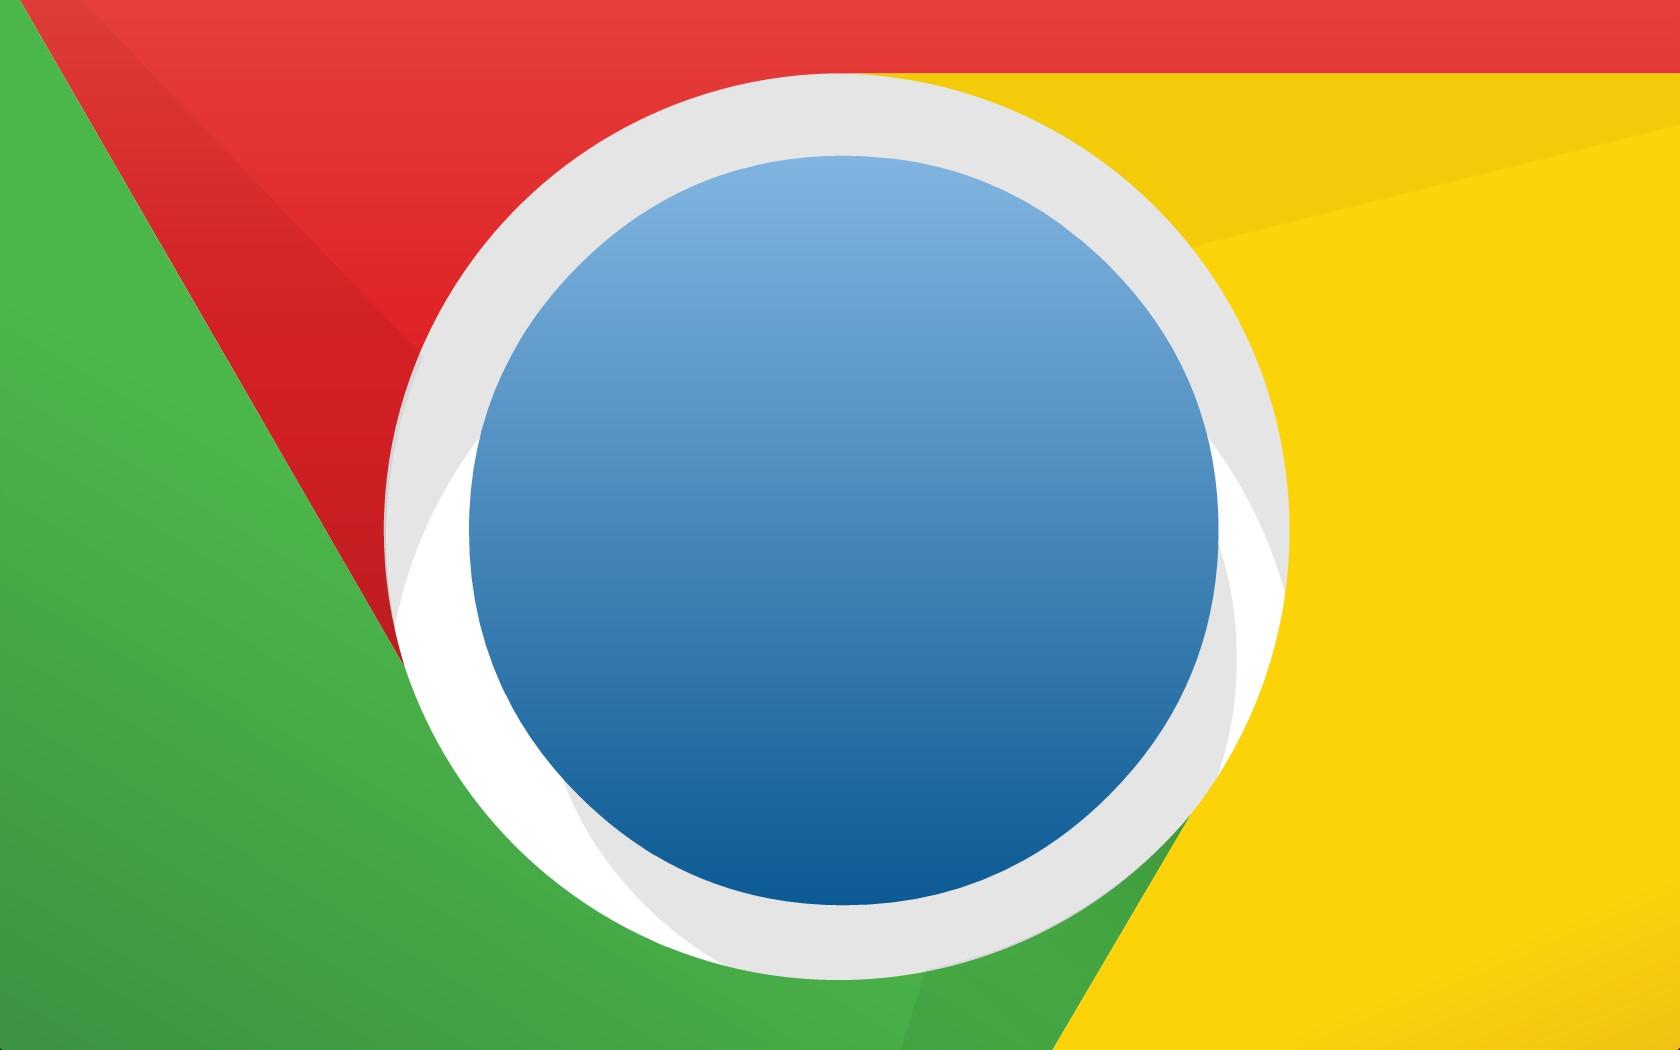 El Bloqueo De Reproduccion Automatica En Google Chrome Da Problemas